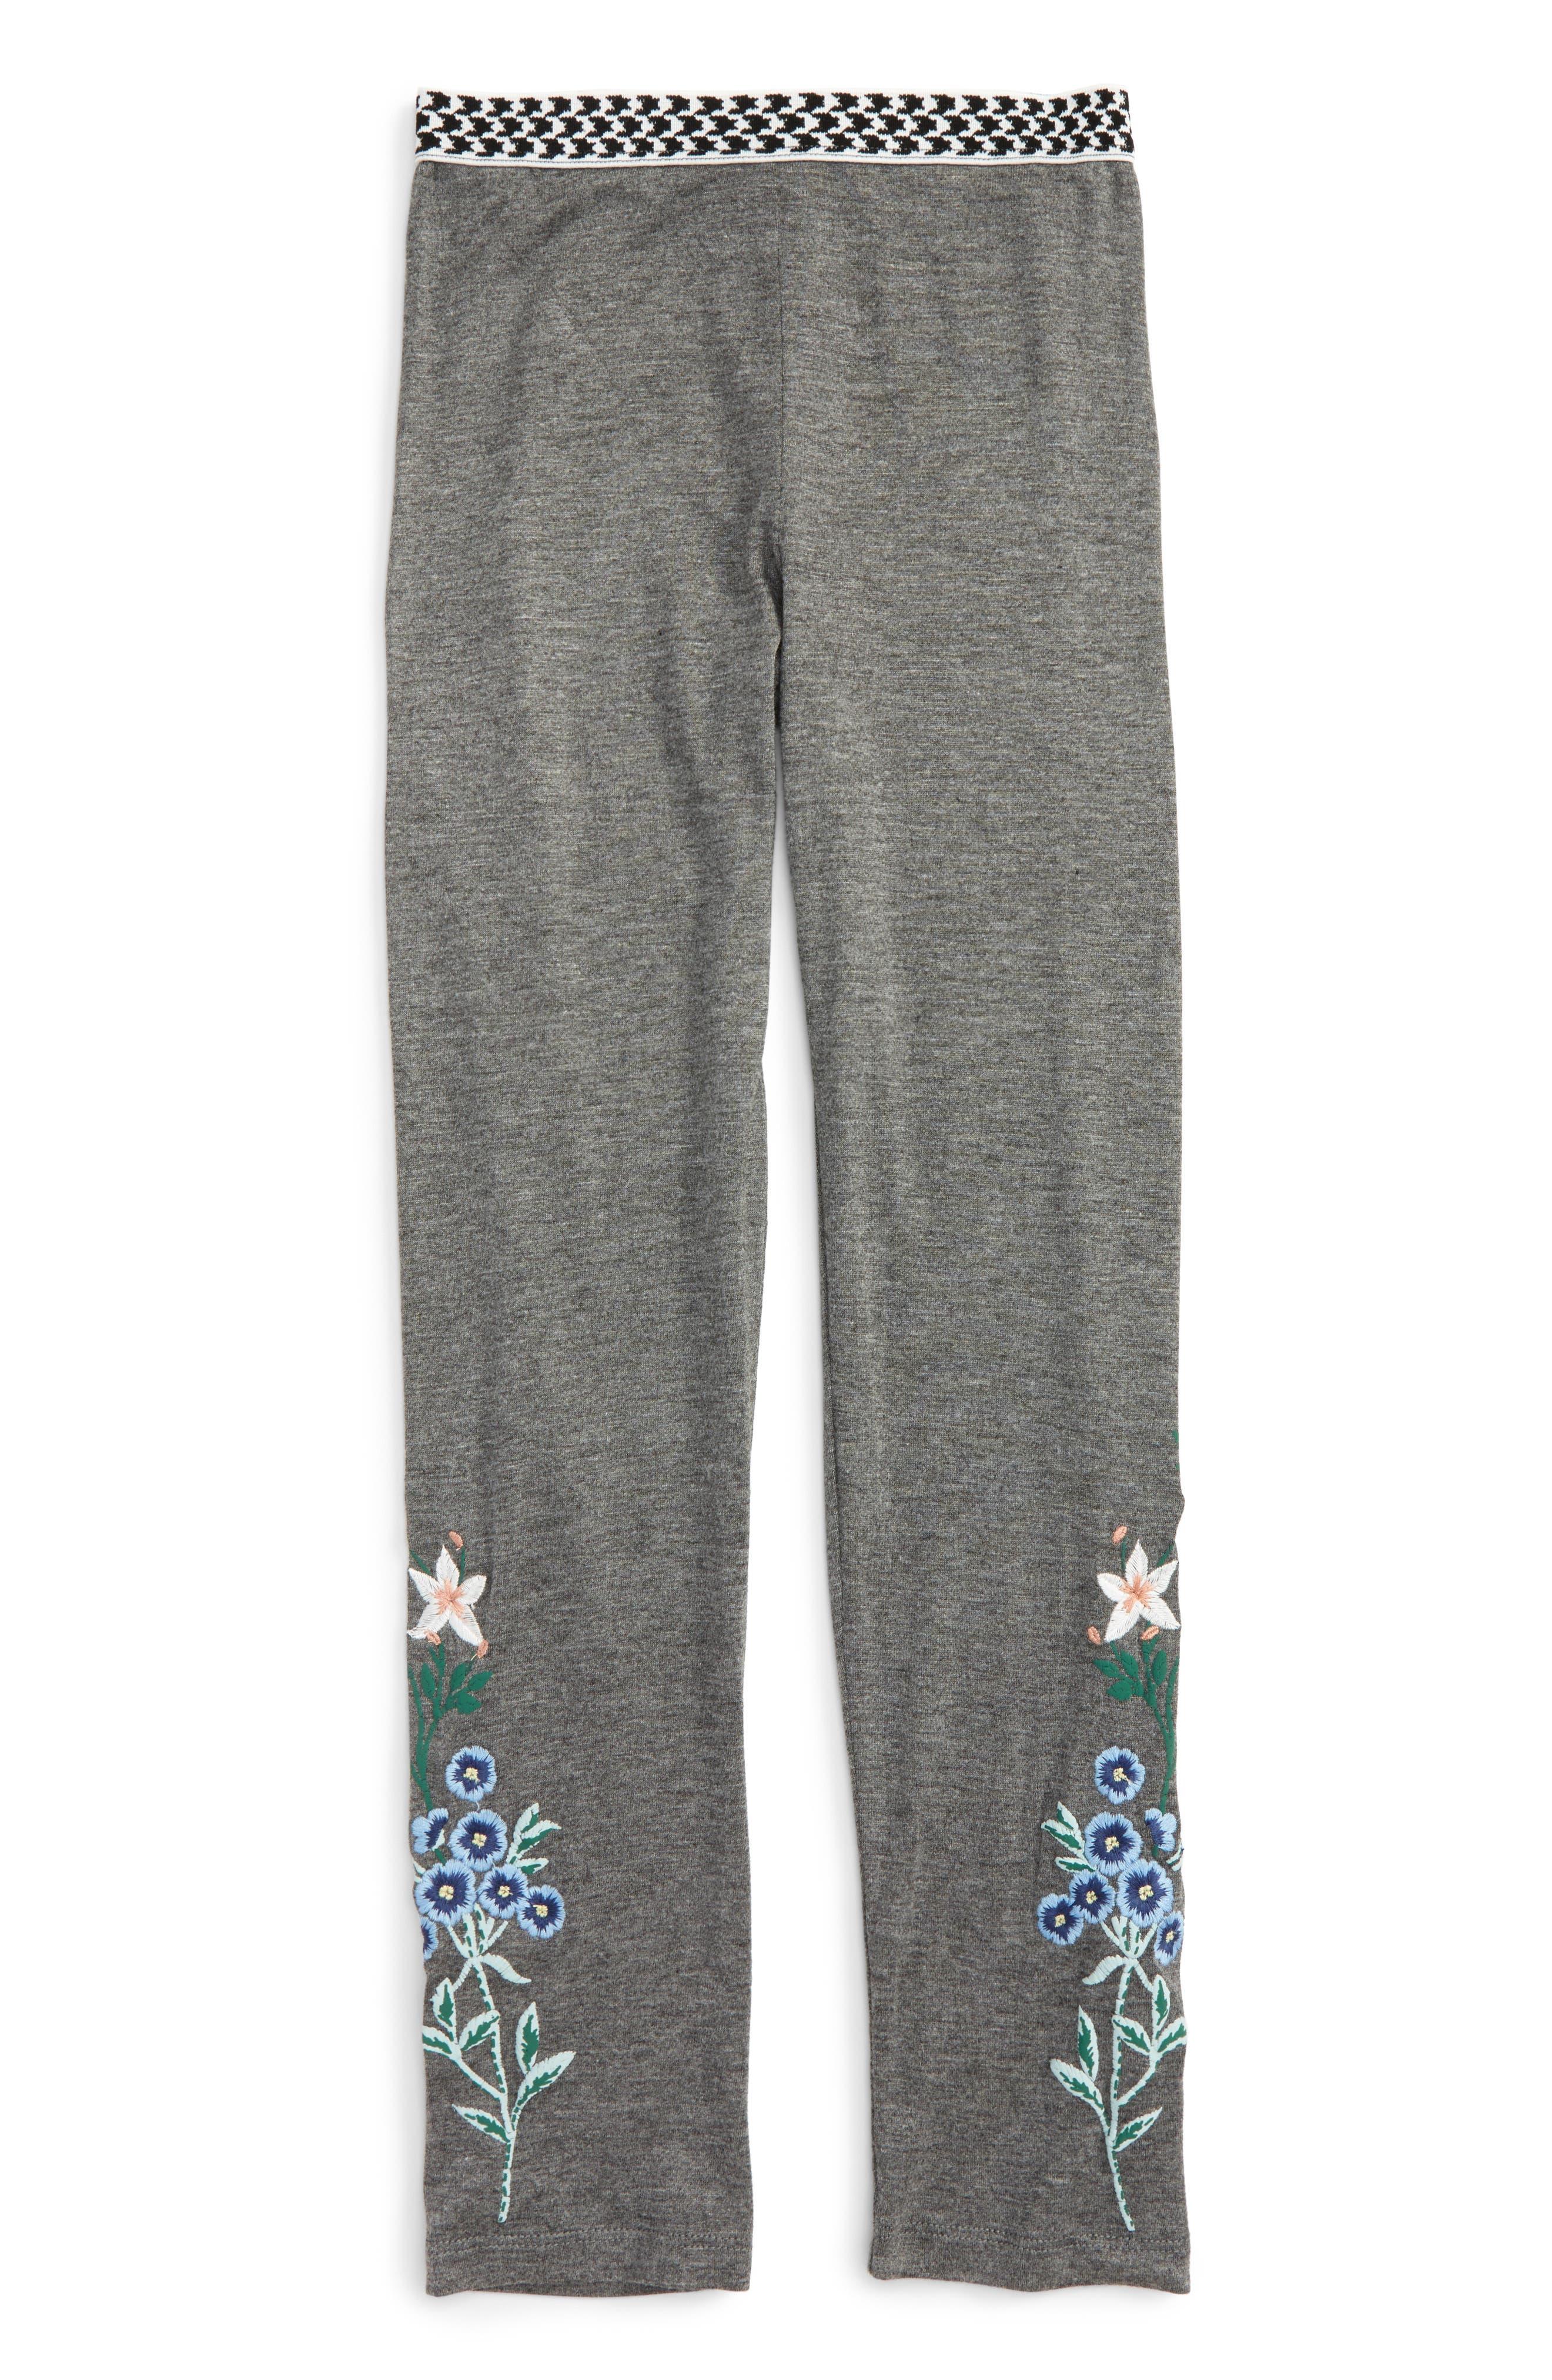 Embroidered Leggings,                             Main thumbnail 1, color,                             Dark Grey